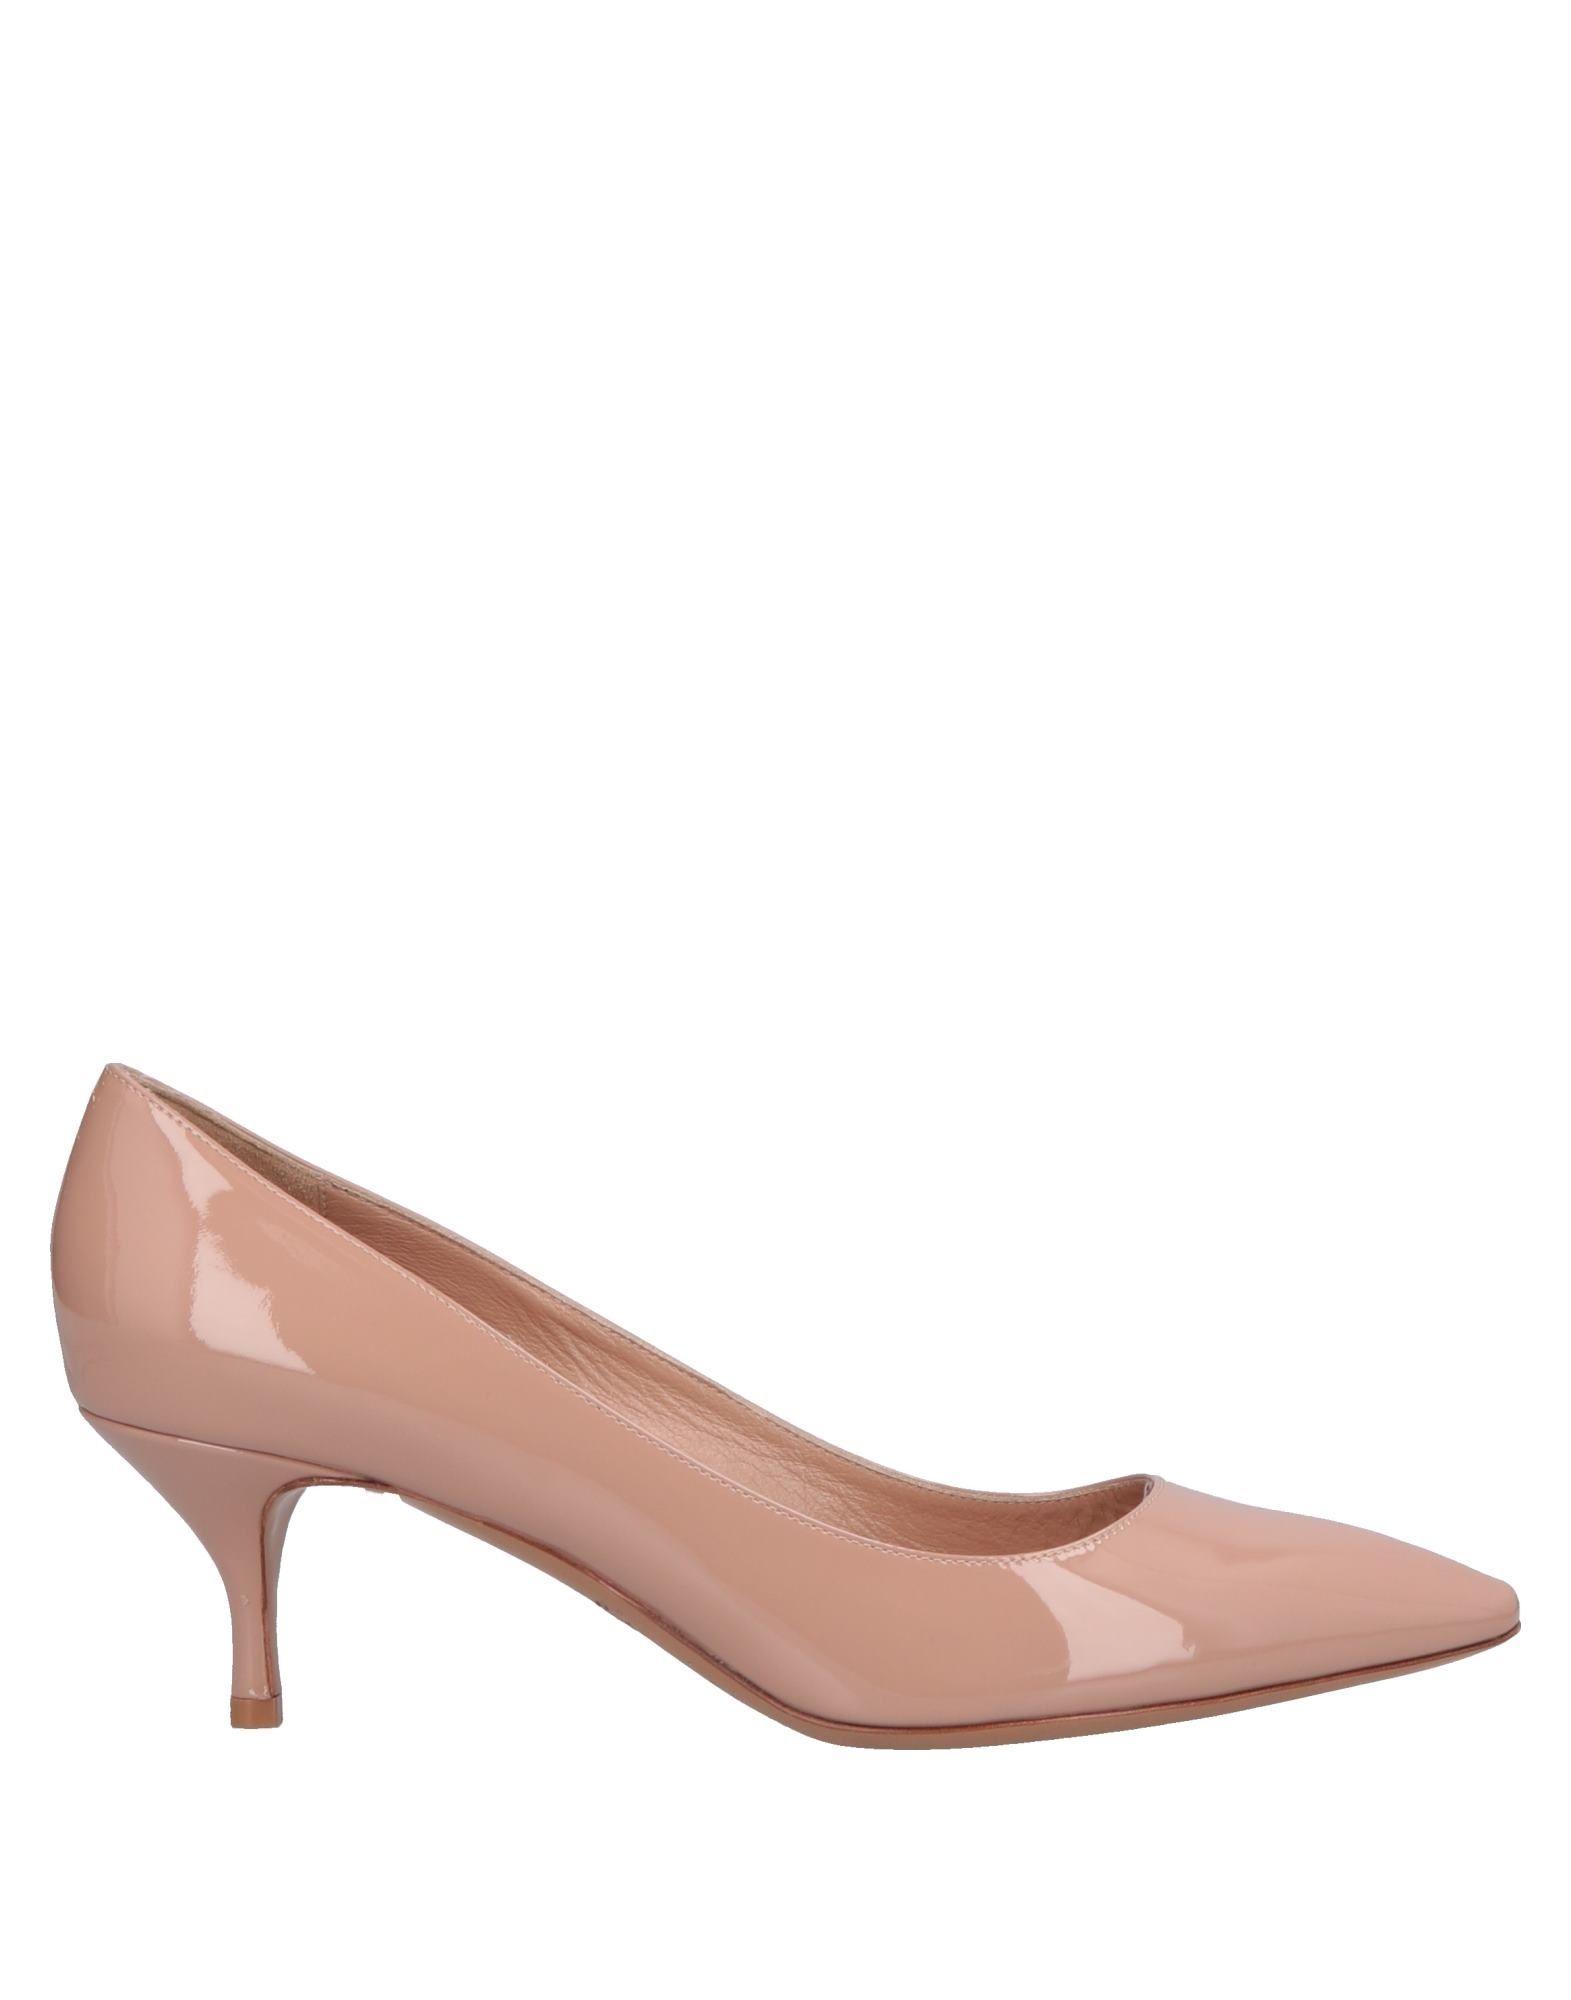 EMPORIO ARMANI Туфли armani emporio armani г розового золота с бриллиантами шпилька серьги перламутр перфорацией egs2364040